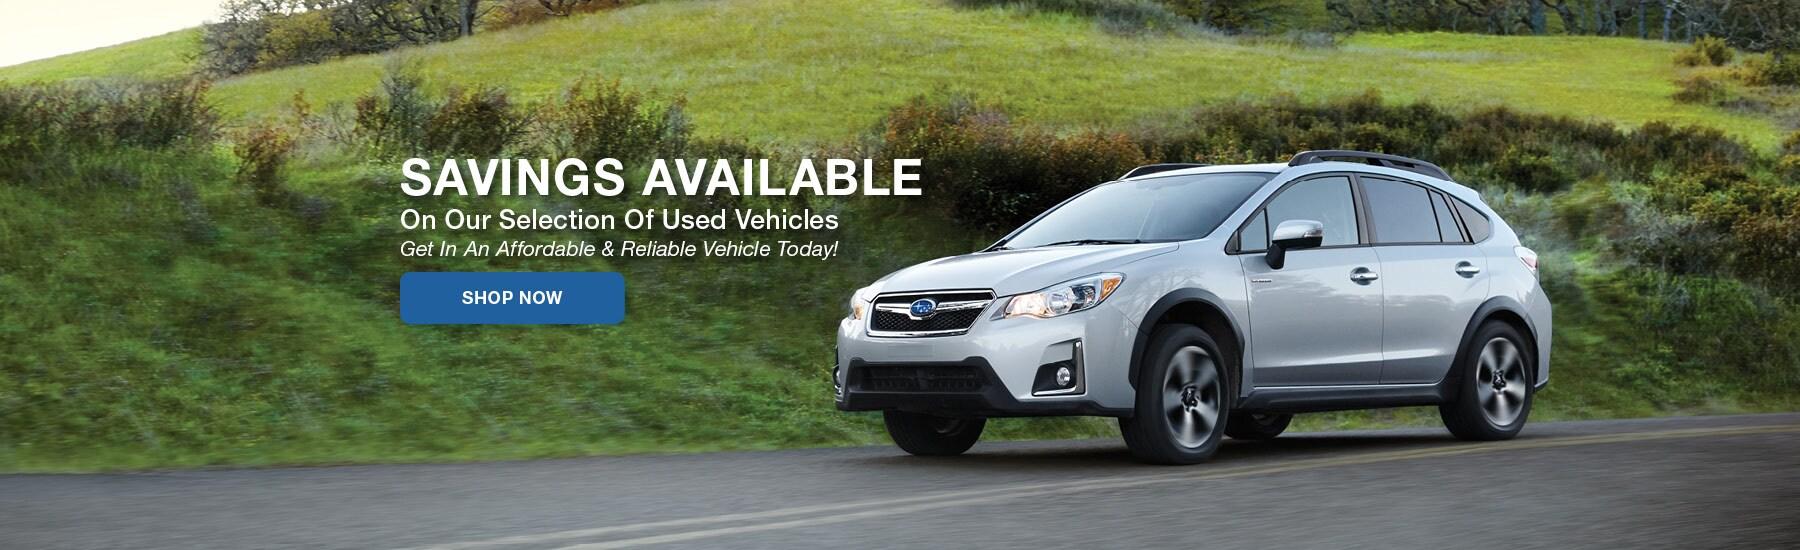 Mccurley Integrity Subaru New Subaru Used Car Dealer In Pasco